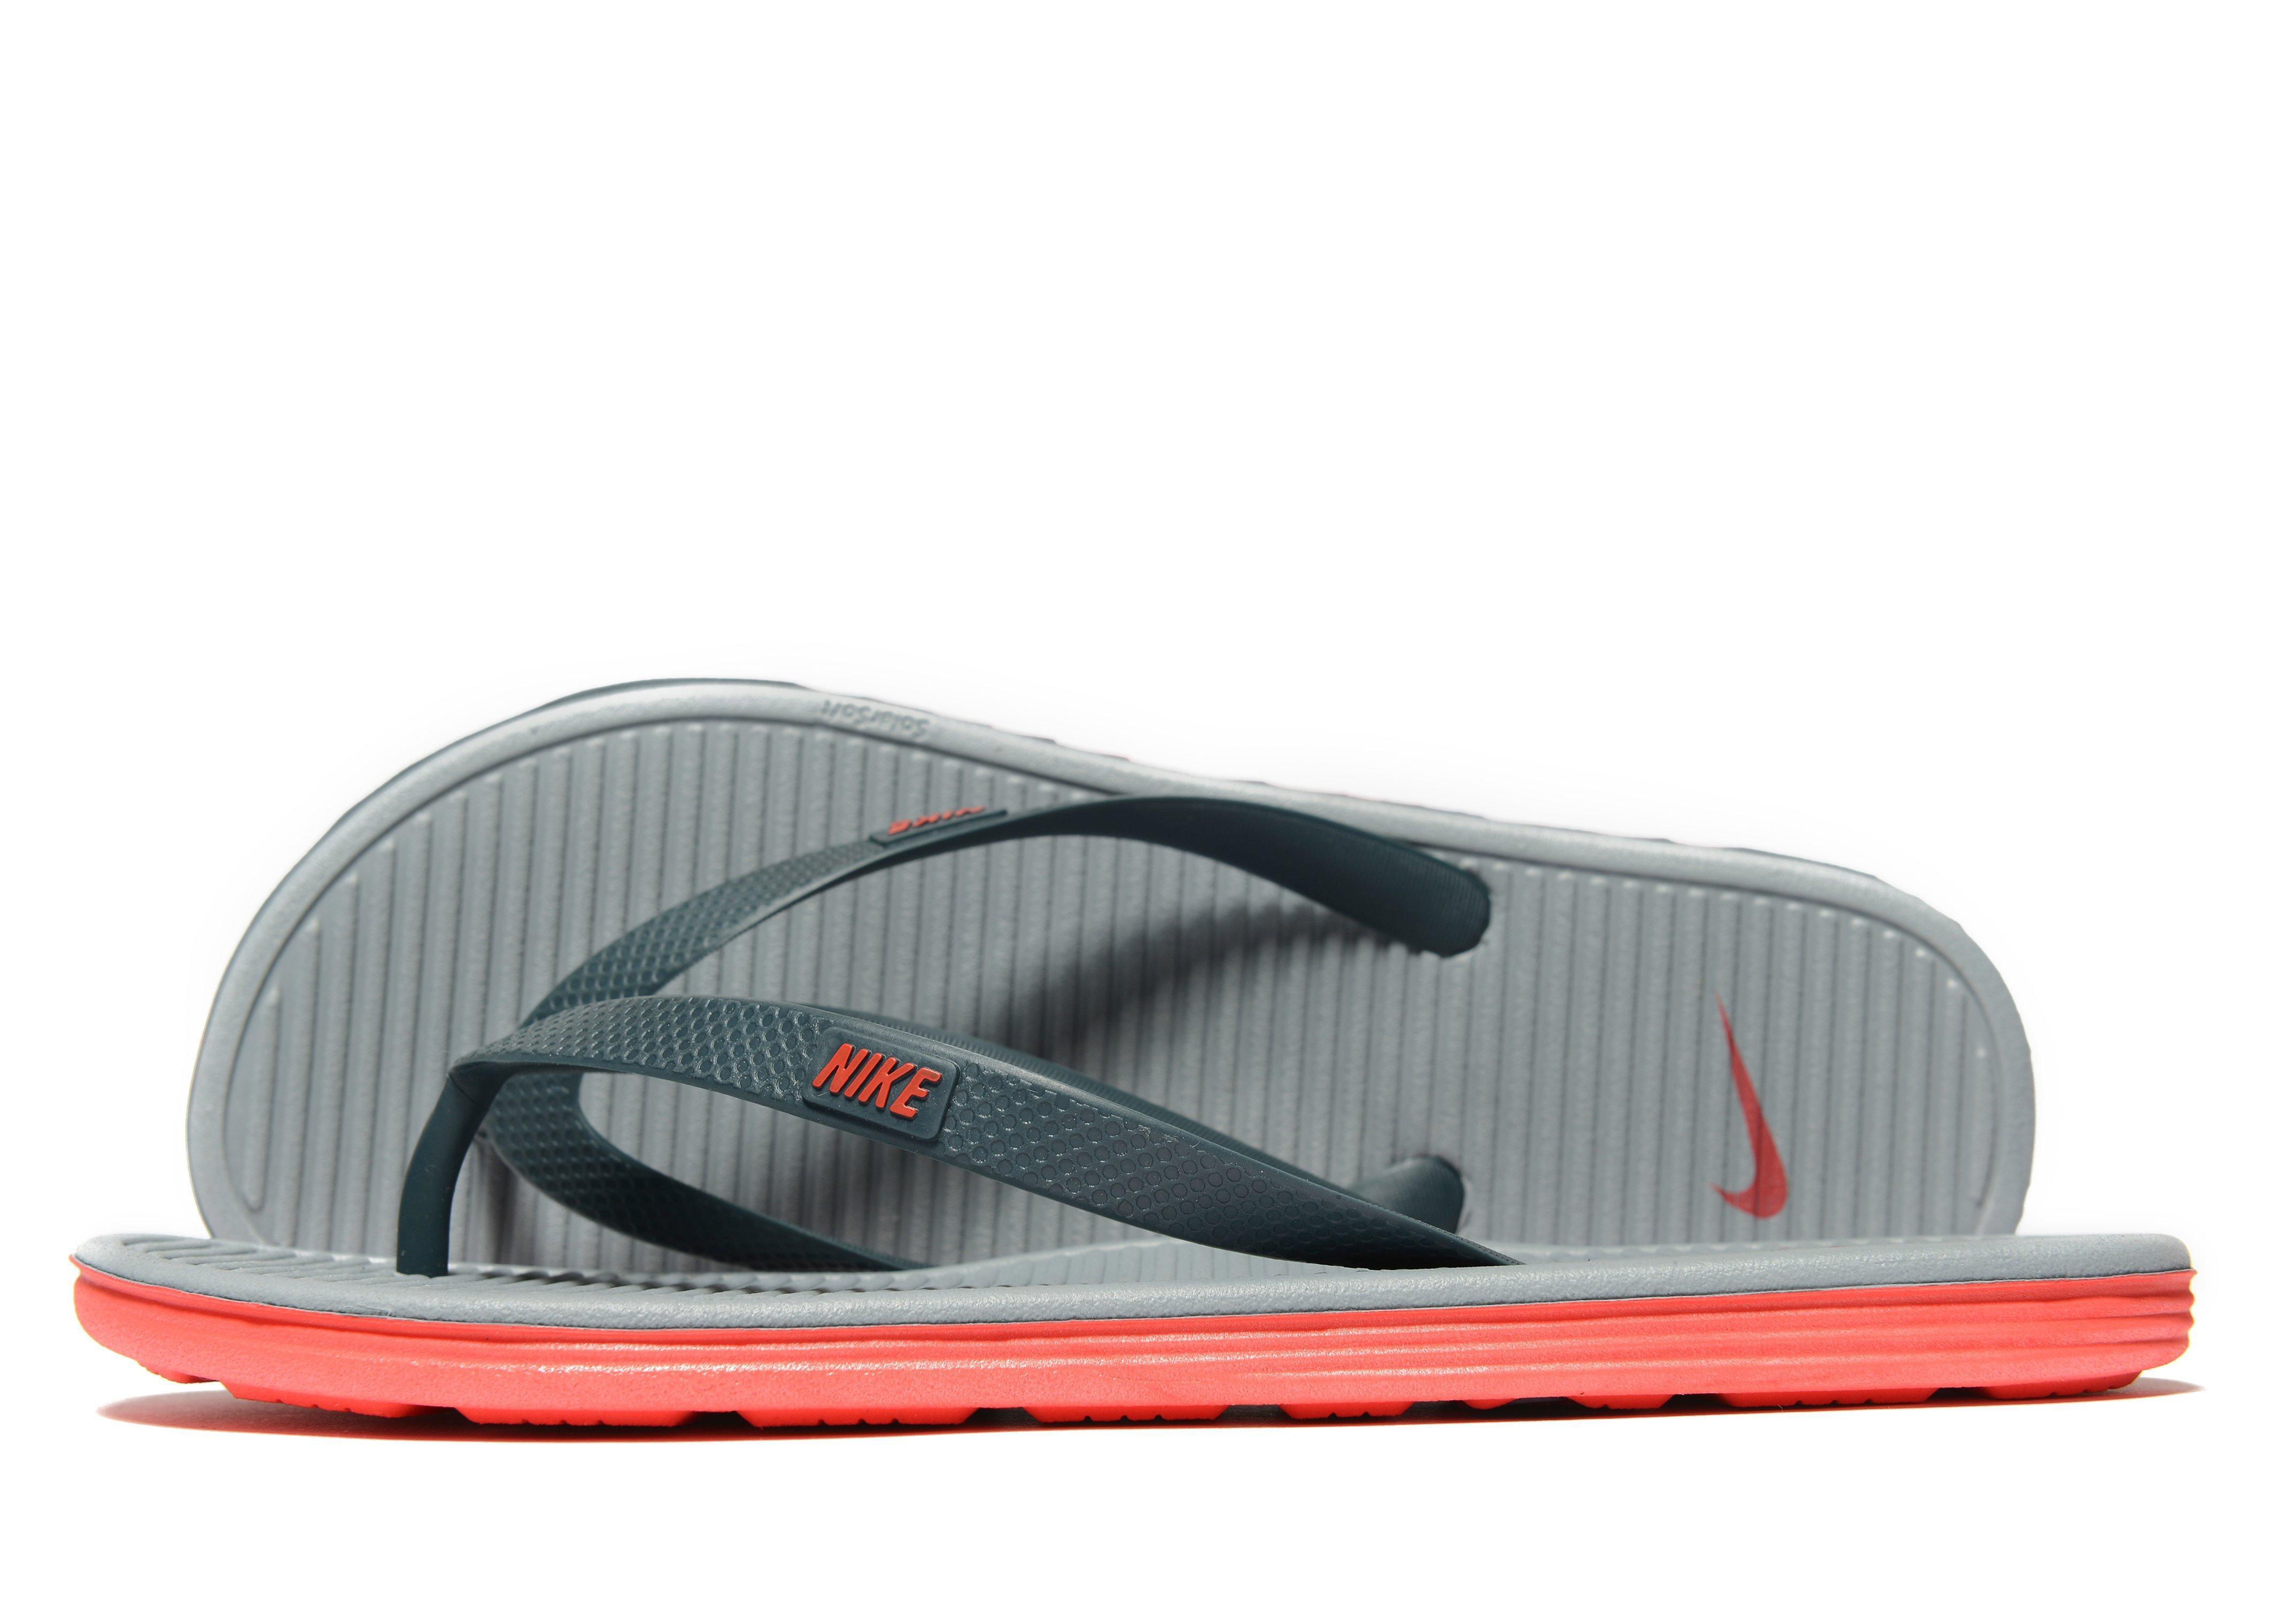 e61fba0cae8 Nike Solarsoft Ii Flipflops in Gray for Men - Lyst